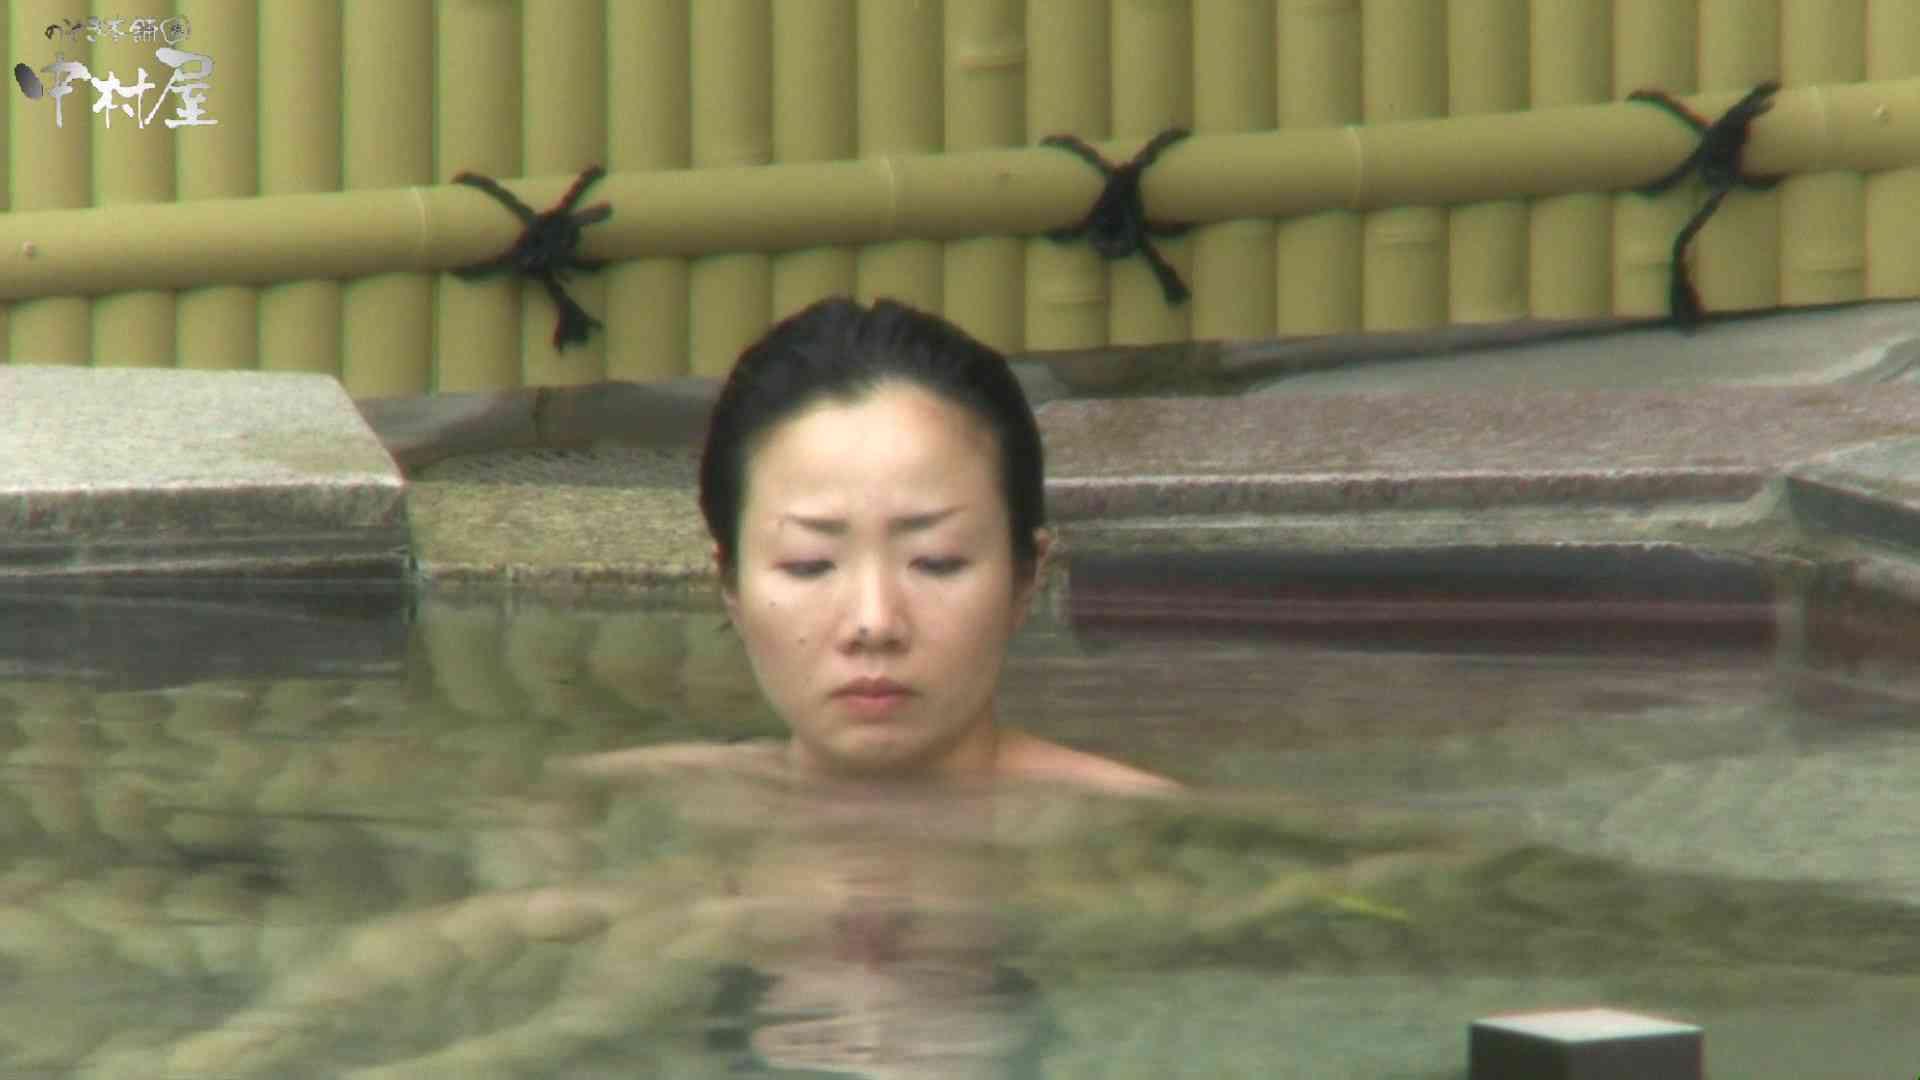 Aquaな露天風呂Vol.950 美しいOLの裸体 | 露天風呂突入  75pic 34